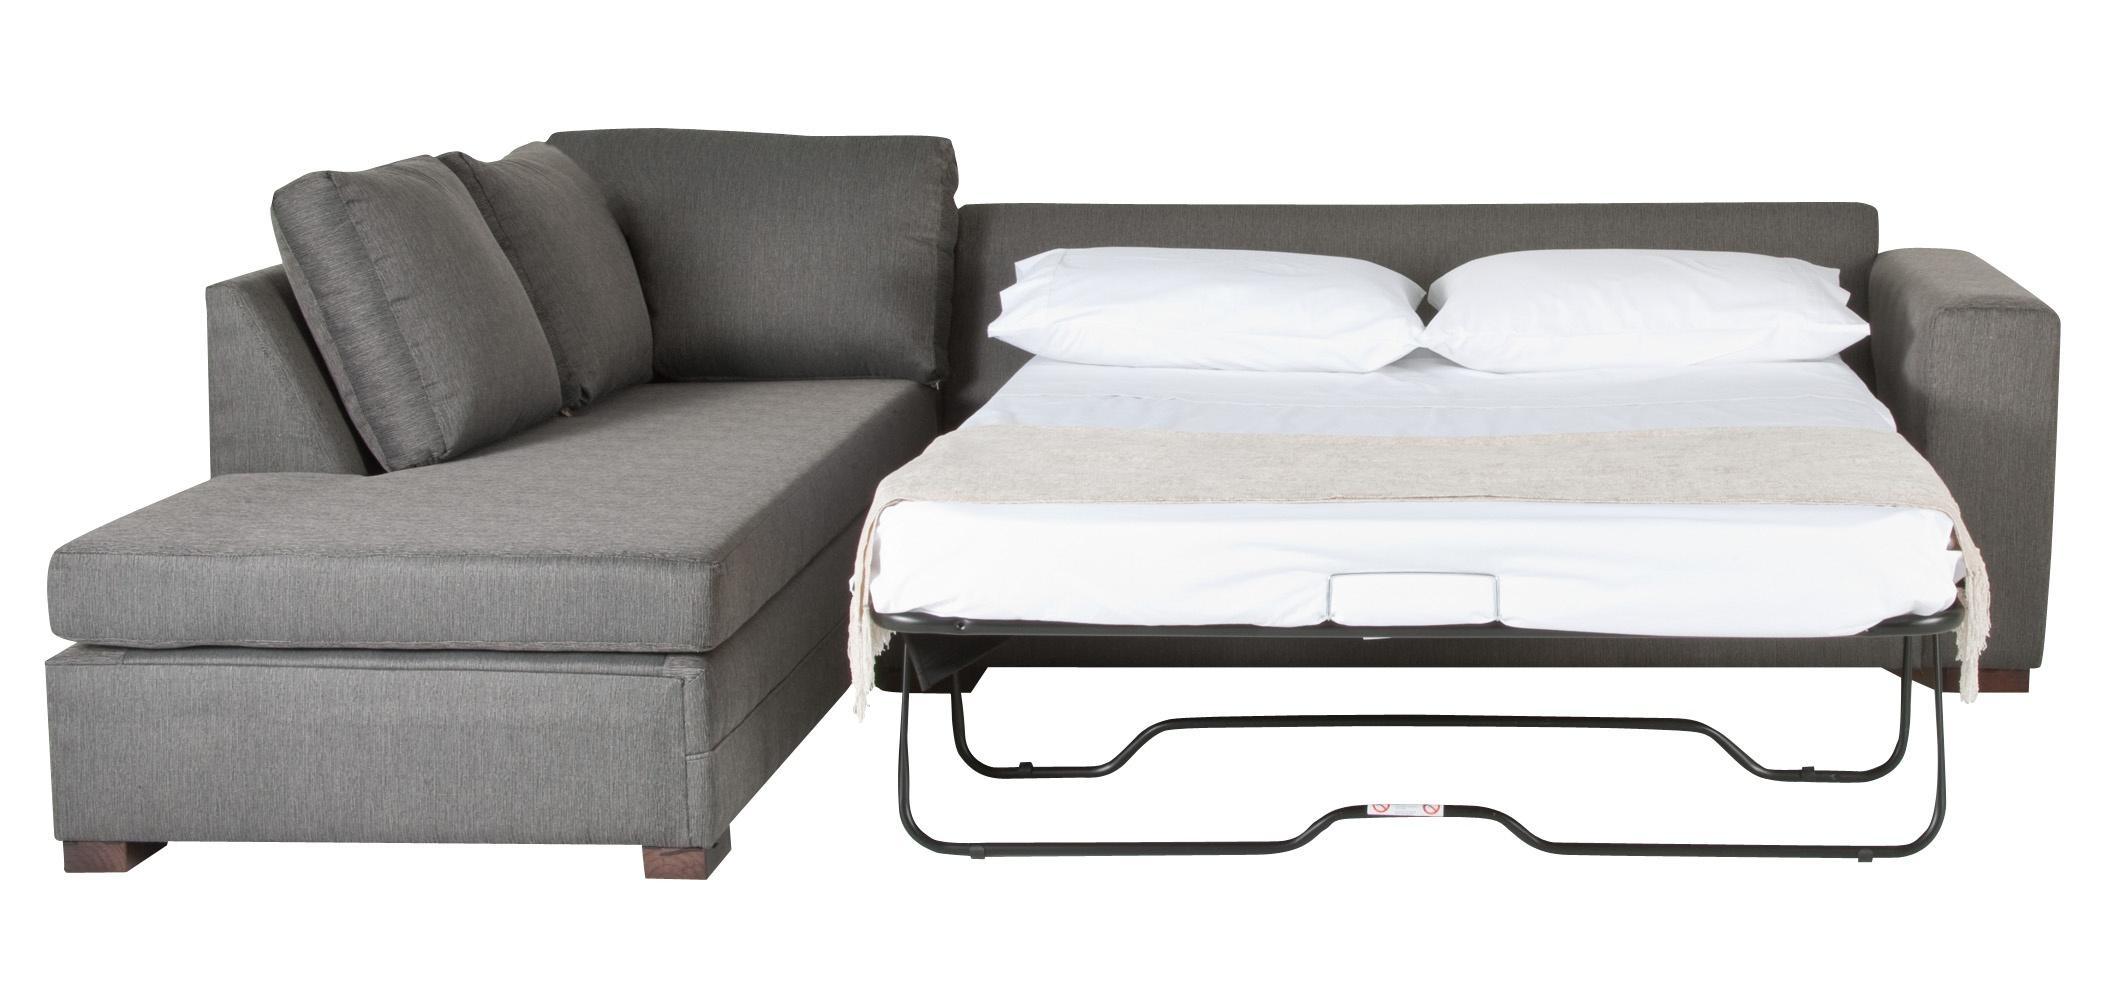 Corner Sleeper Sofa Bed – Ansugallery Regarding Corner Sleeper Sofas (Image 3 of 20)